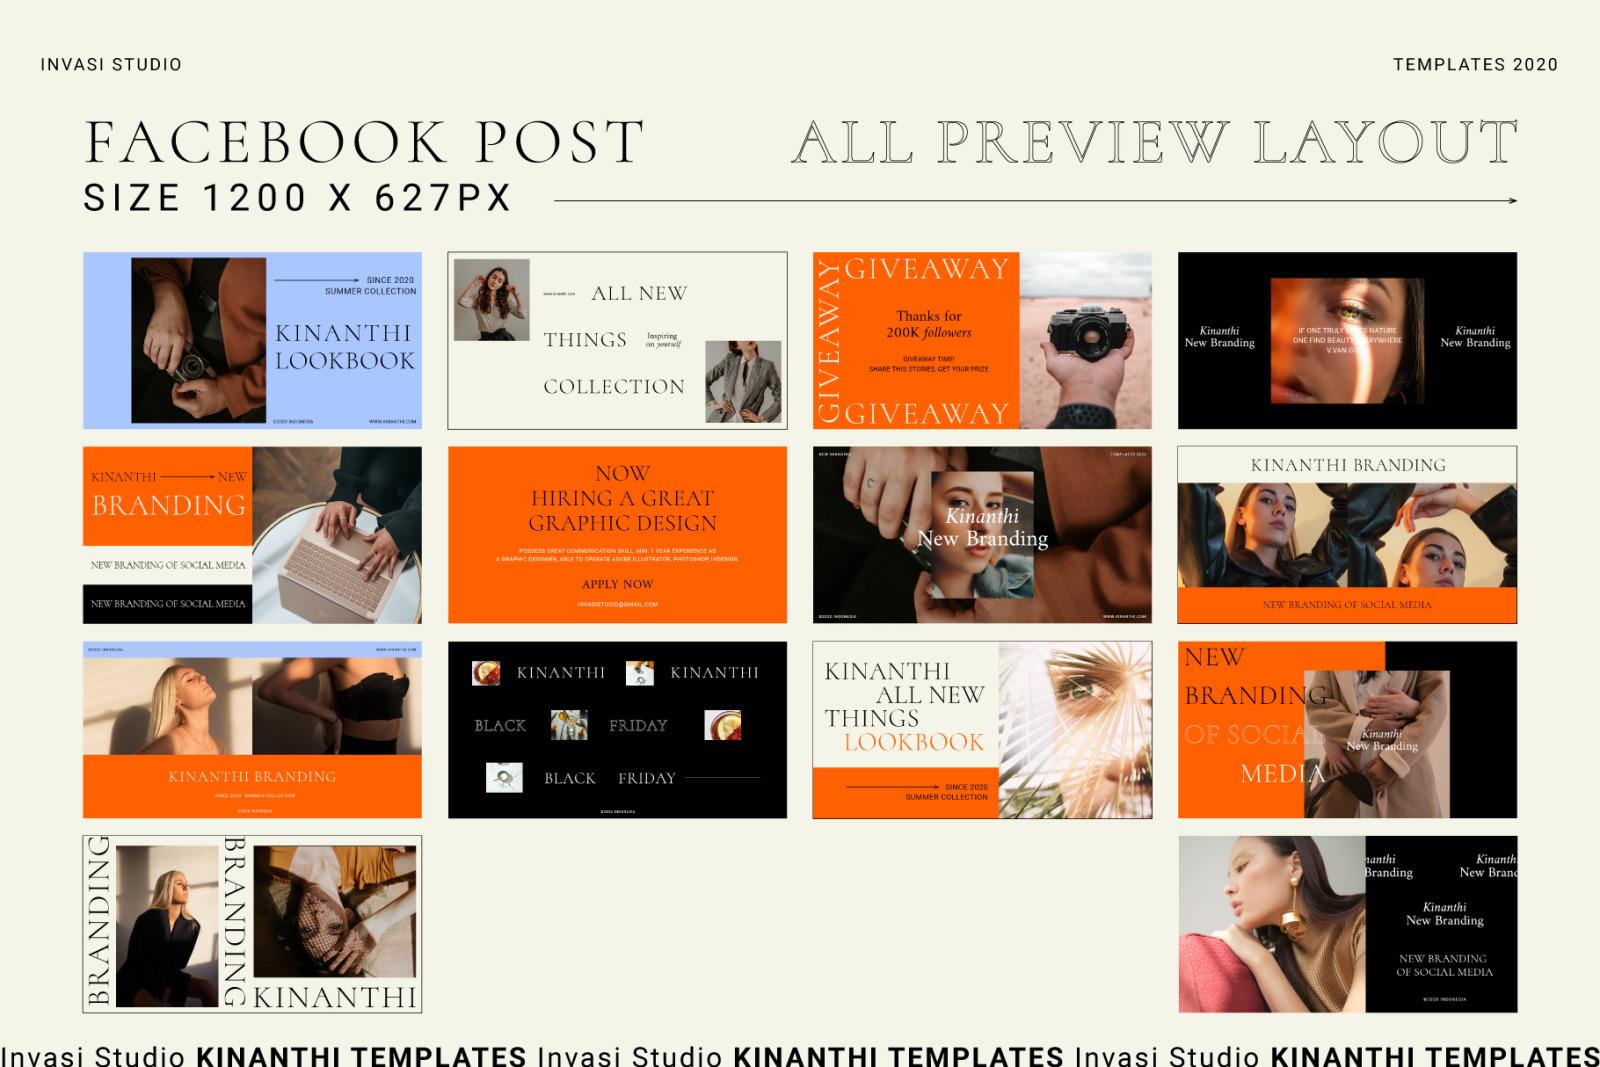 KINANTHI - Social Media Brand Templates